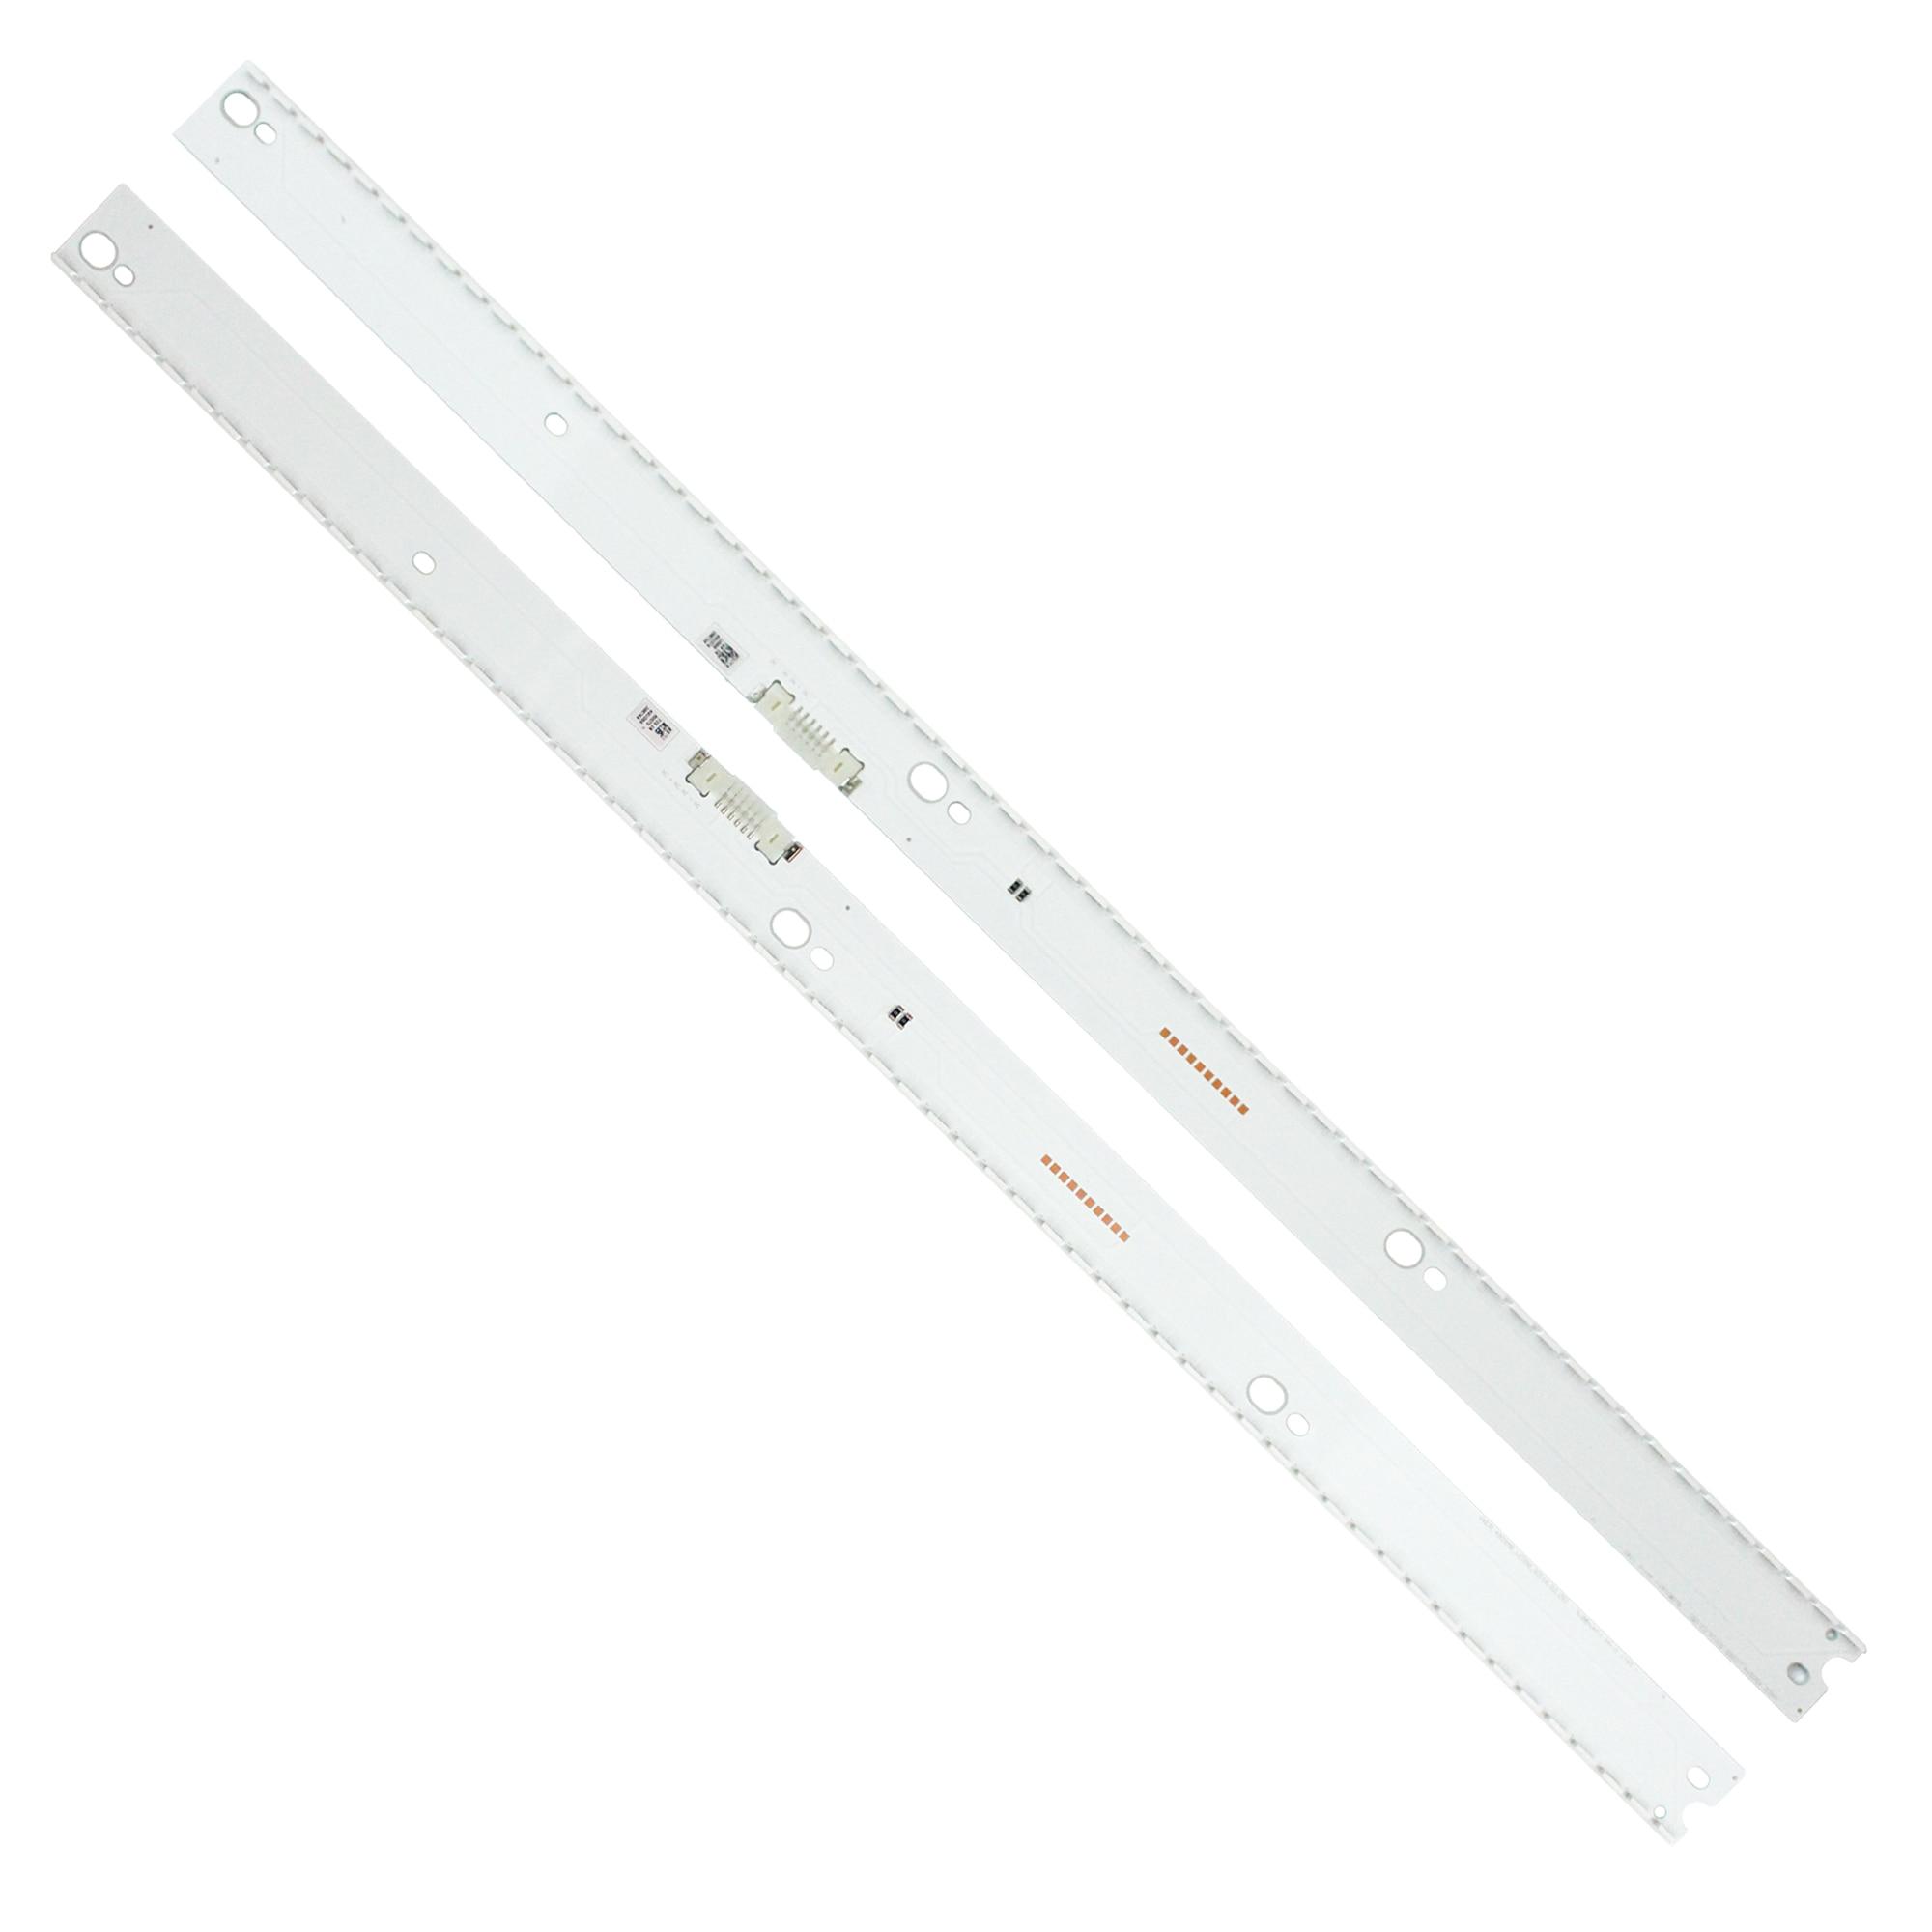 LED الخلفية قطاع لسامسونج UE49MU6449 UE49MU6445 UE49MU6442 UE49MU6440 UE49MU6409 UE49MU6405 UE49MU6402 CY-KK049HGEV1H